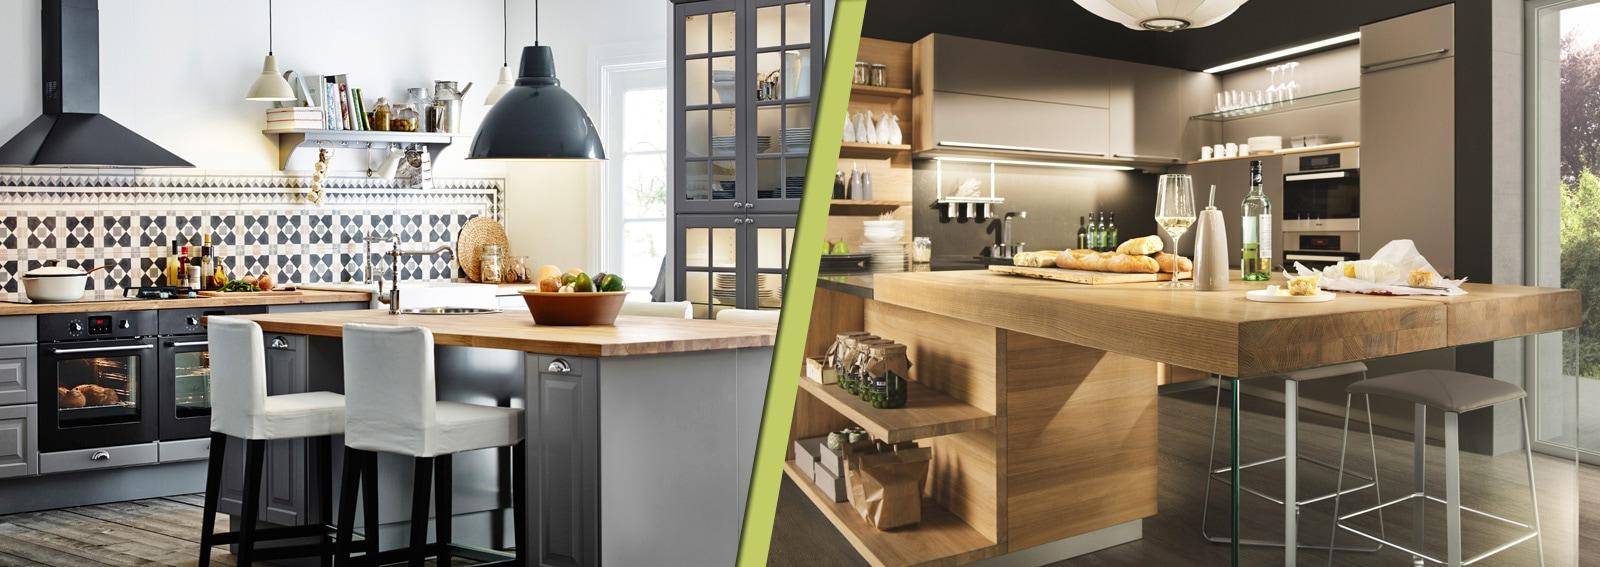 Best Piano Di Lavoro Cucina Ikea Photos - Acomo.us - acomo.us